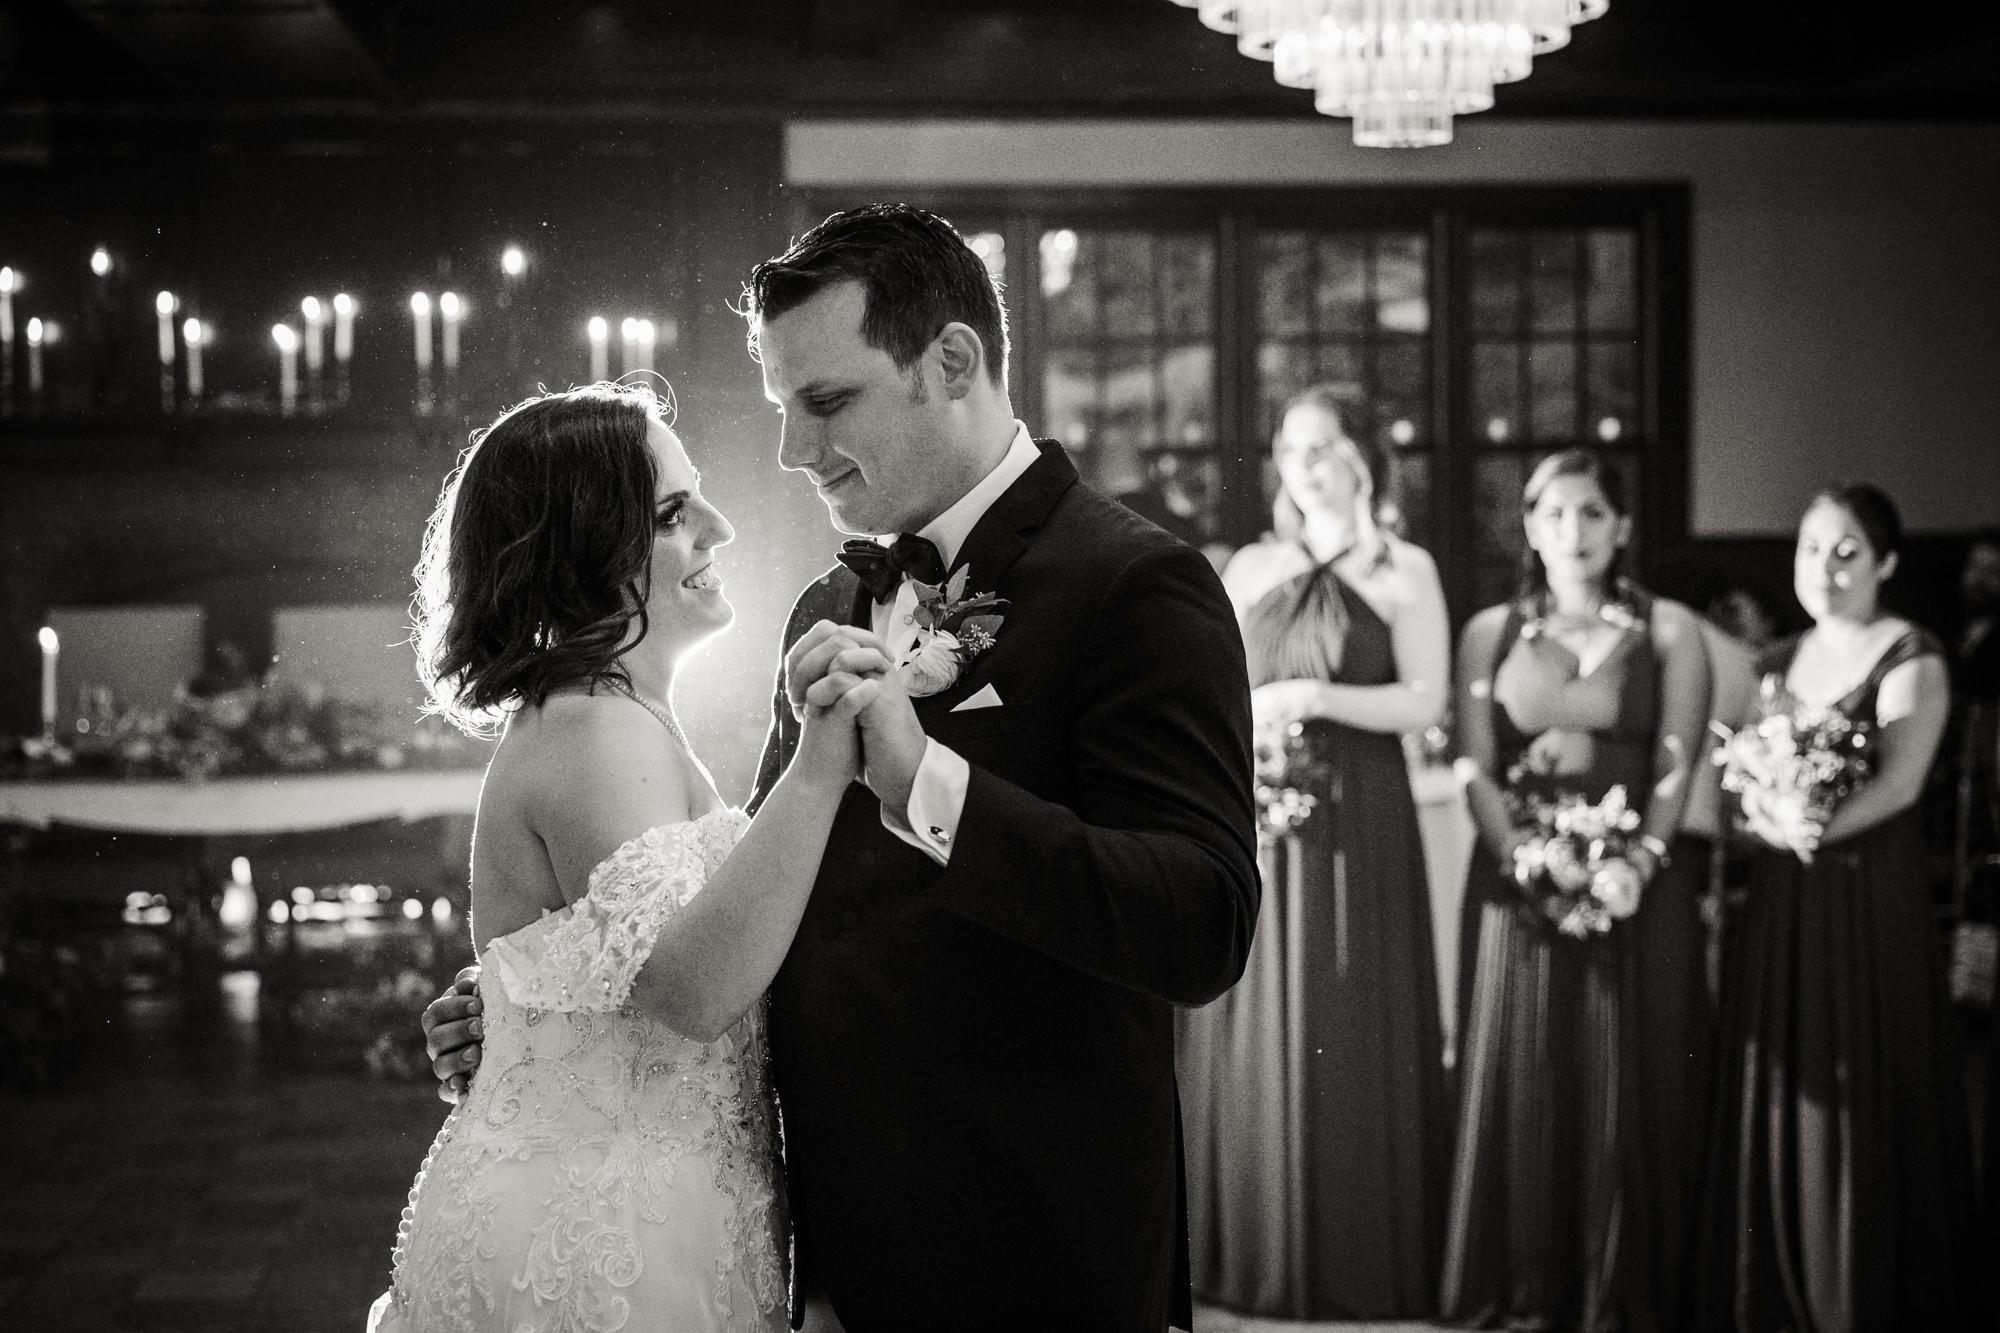 Hotel Du Village - LoveStruck Pictures - Wedding Photography-084.jpg